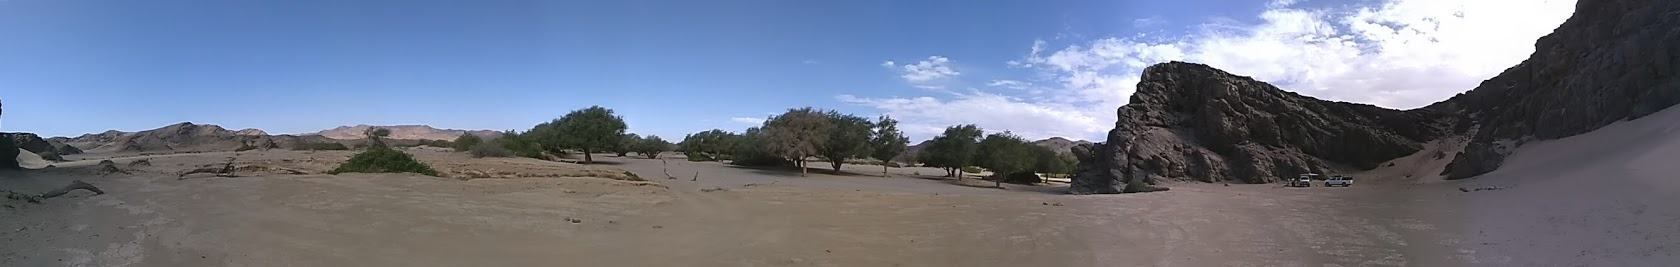 Wildcamping am Rande des Huanib